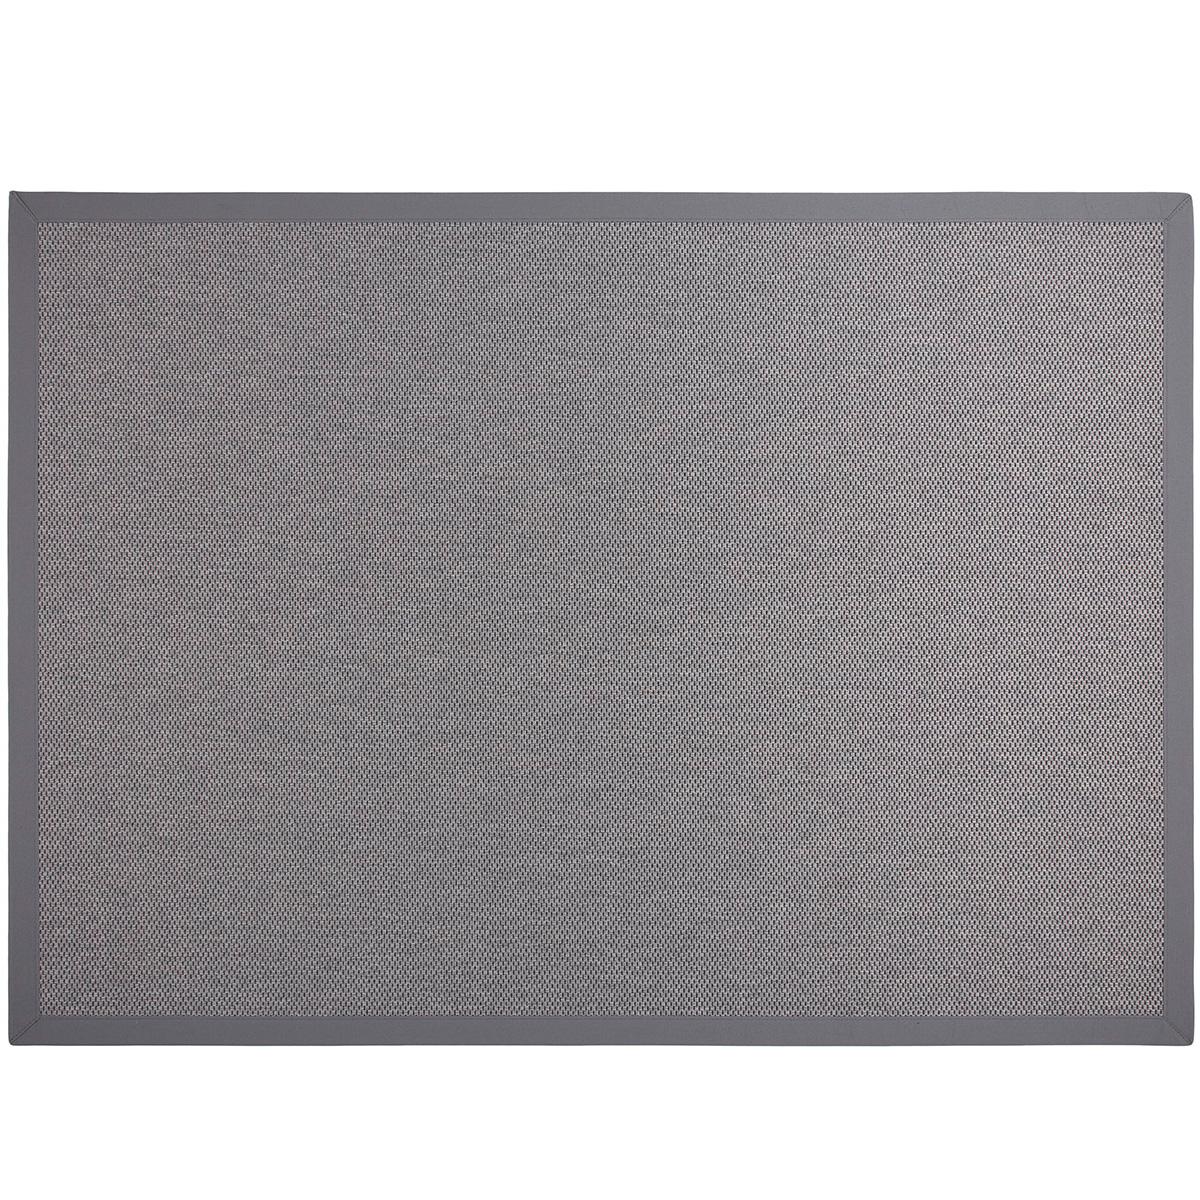 Vloerkleed Brinker Dynamo Silver | 165 x 230 cm